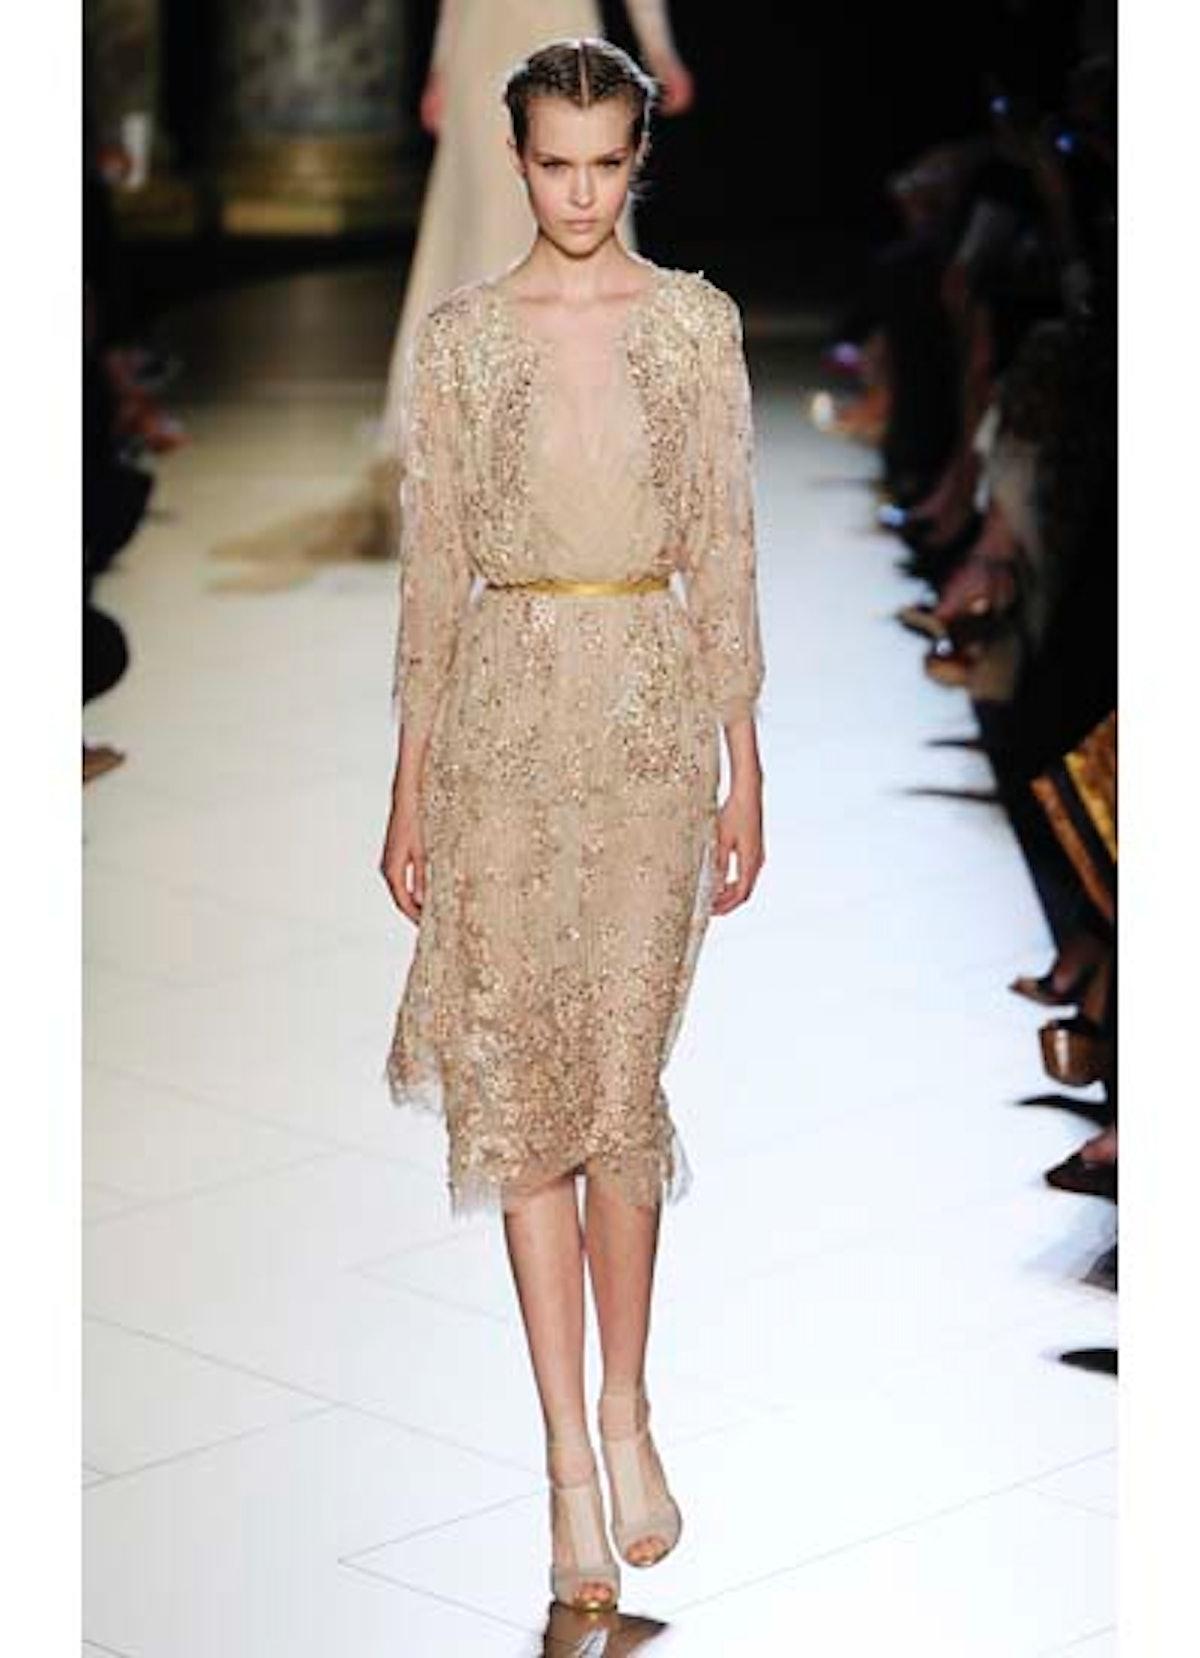 fass-elie-saab-couture-2012-runway-10-v.jpg